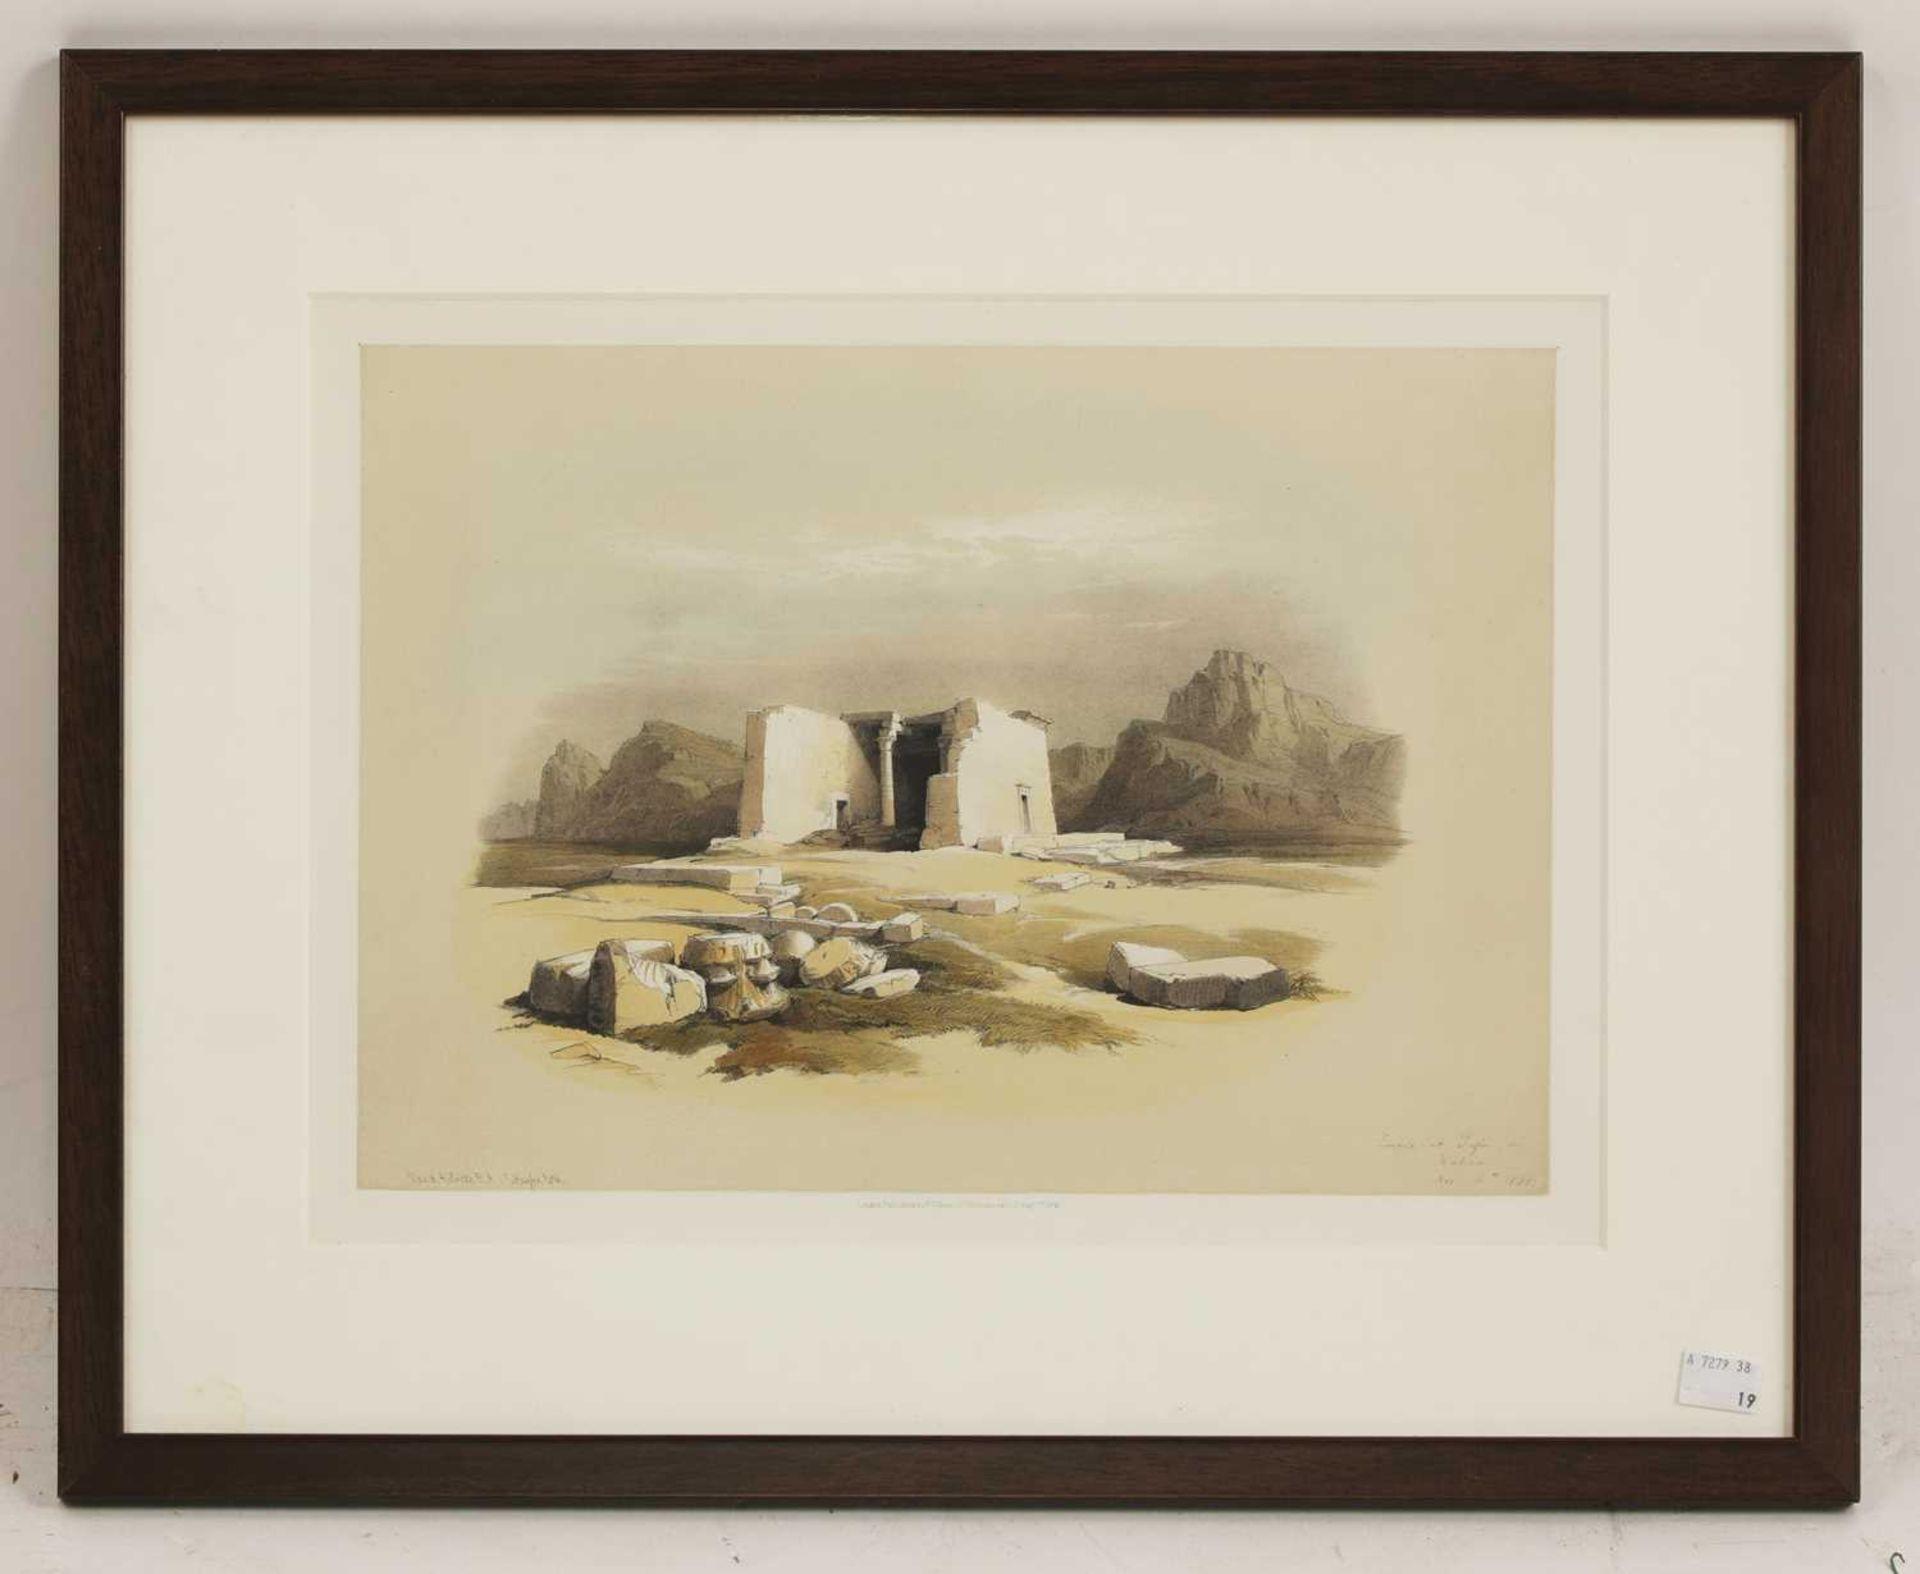 Louis Haghe after David Roberts RA (1796-1864) - Image 8 of 20